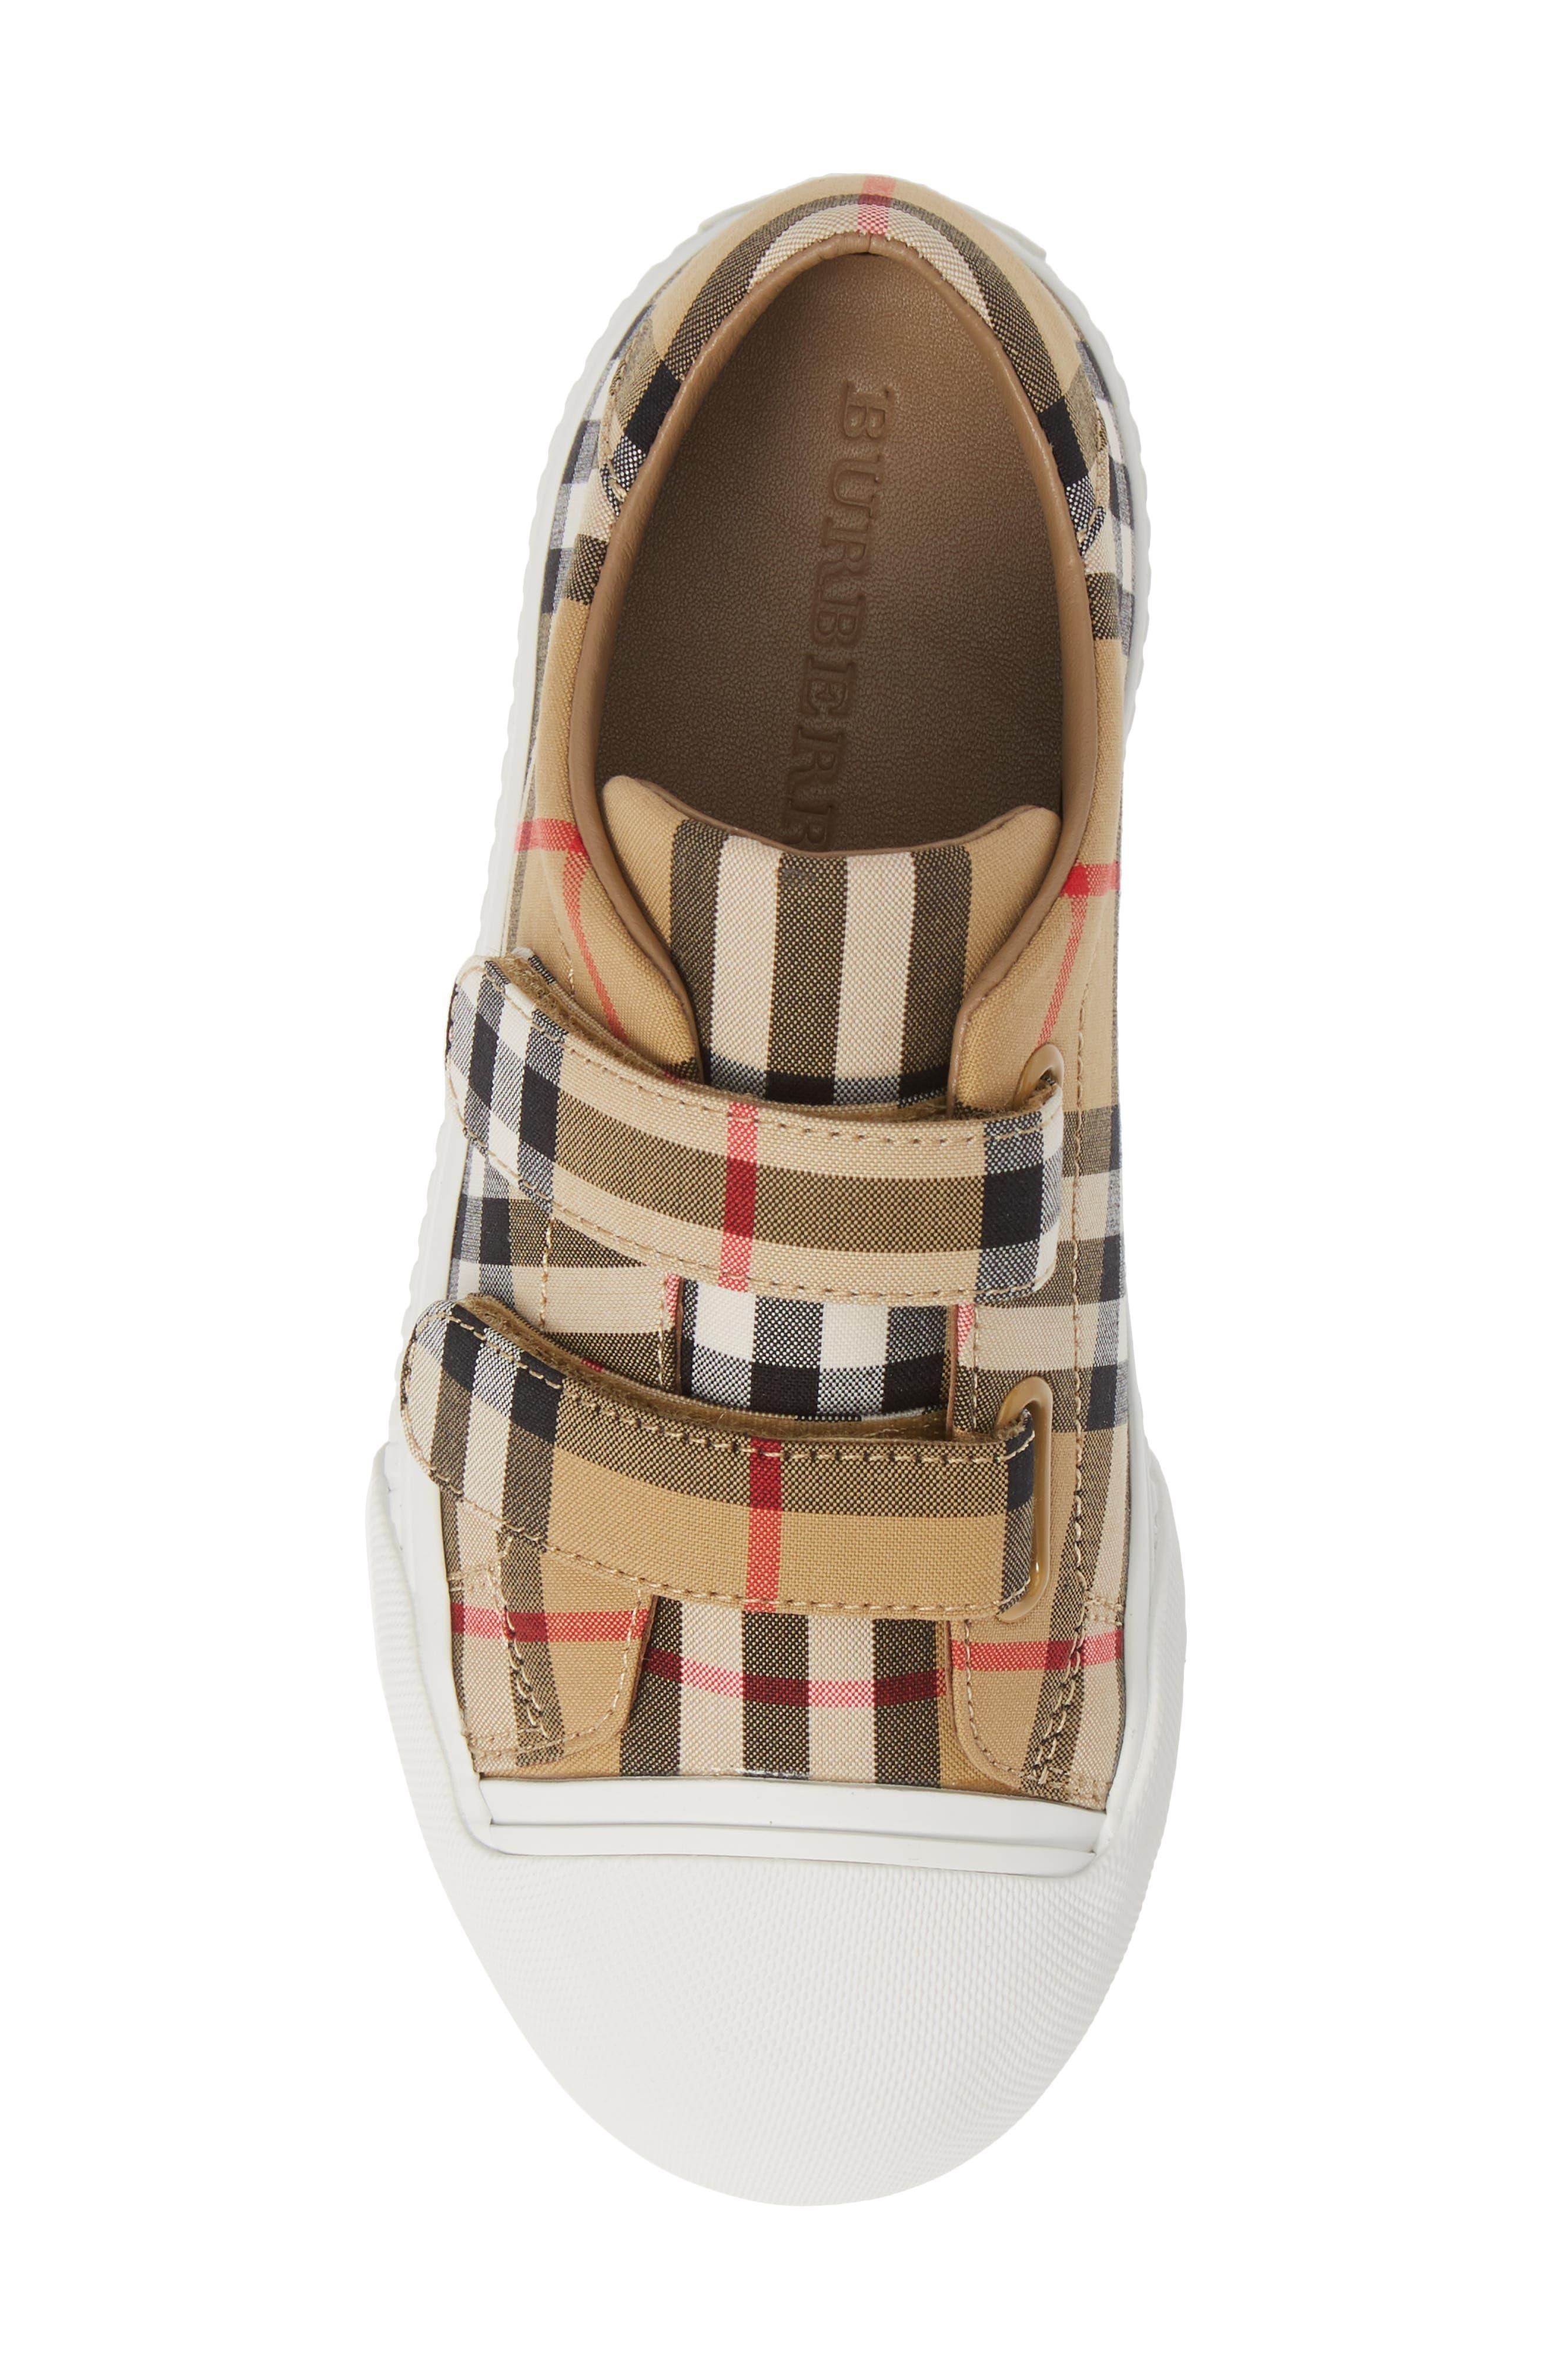 BURBERRY, Belside Sneaker, Alternate thumbnail 5, color, ANTIQUE YELLOW-OPTIC WHITE